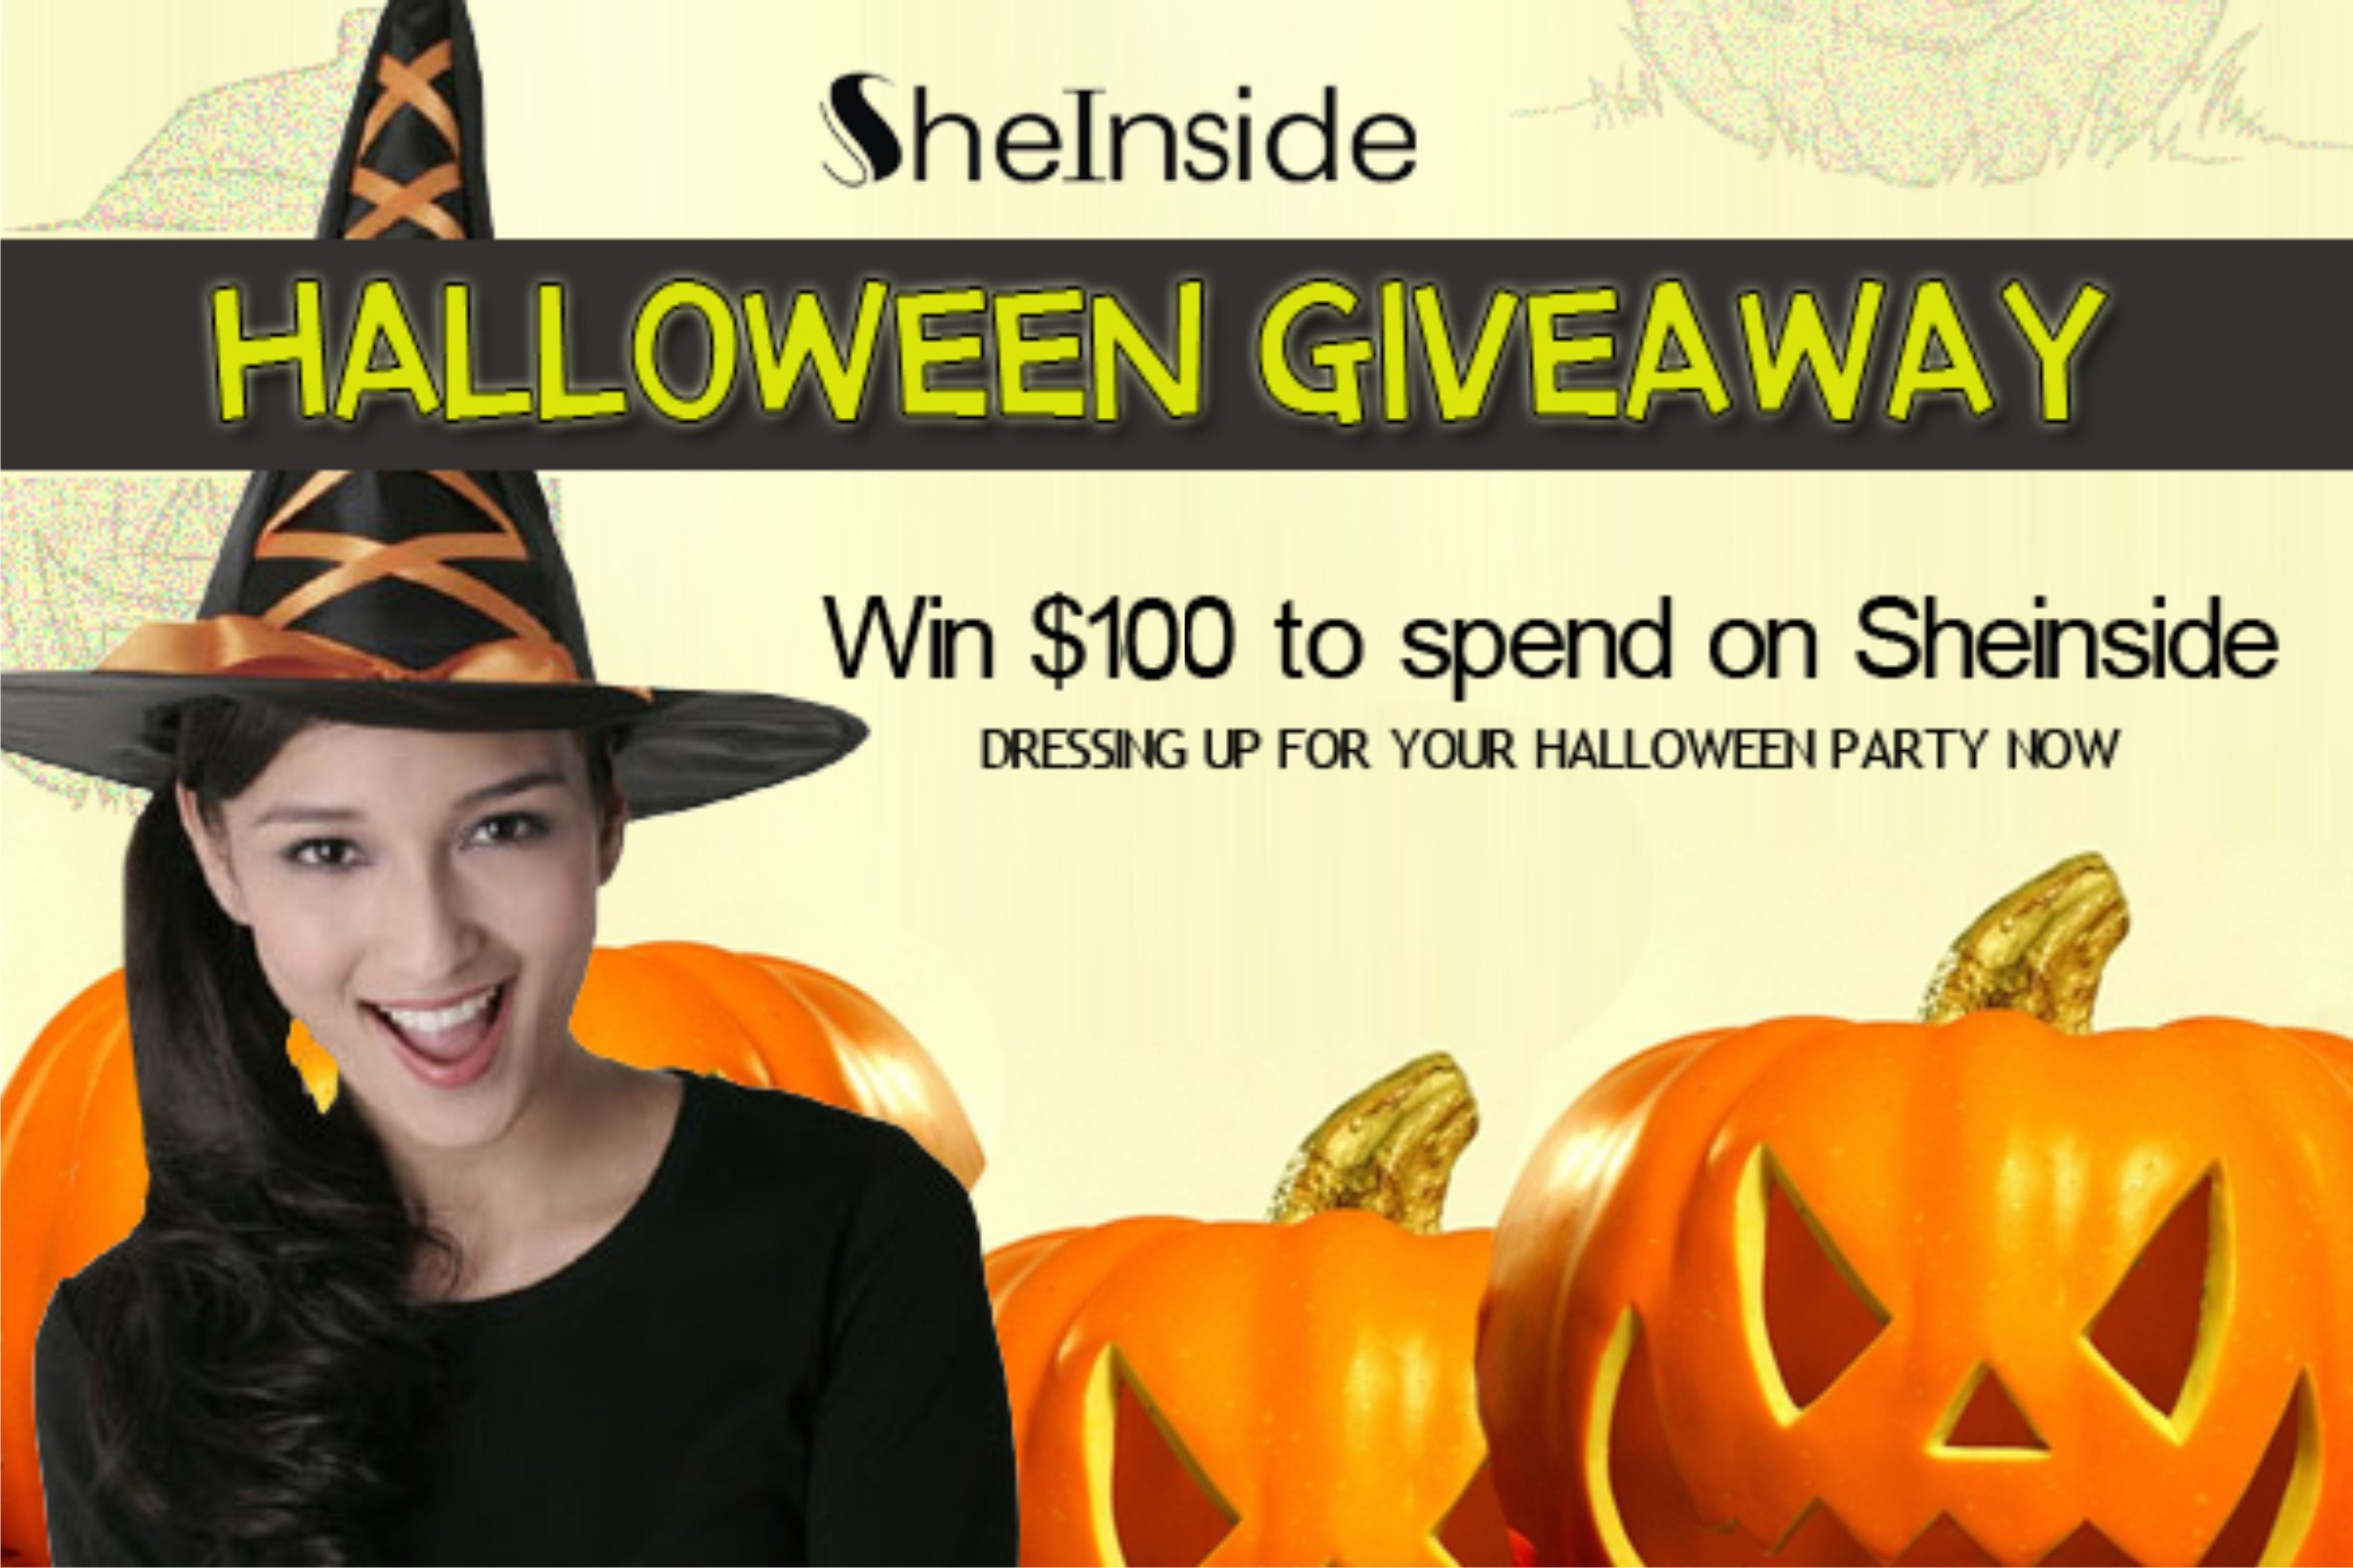 sheinside giveaway halloween